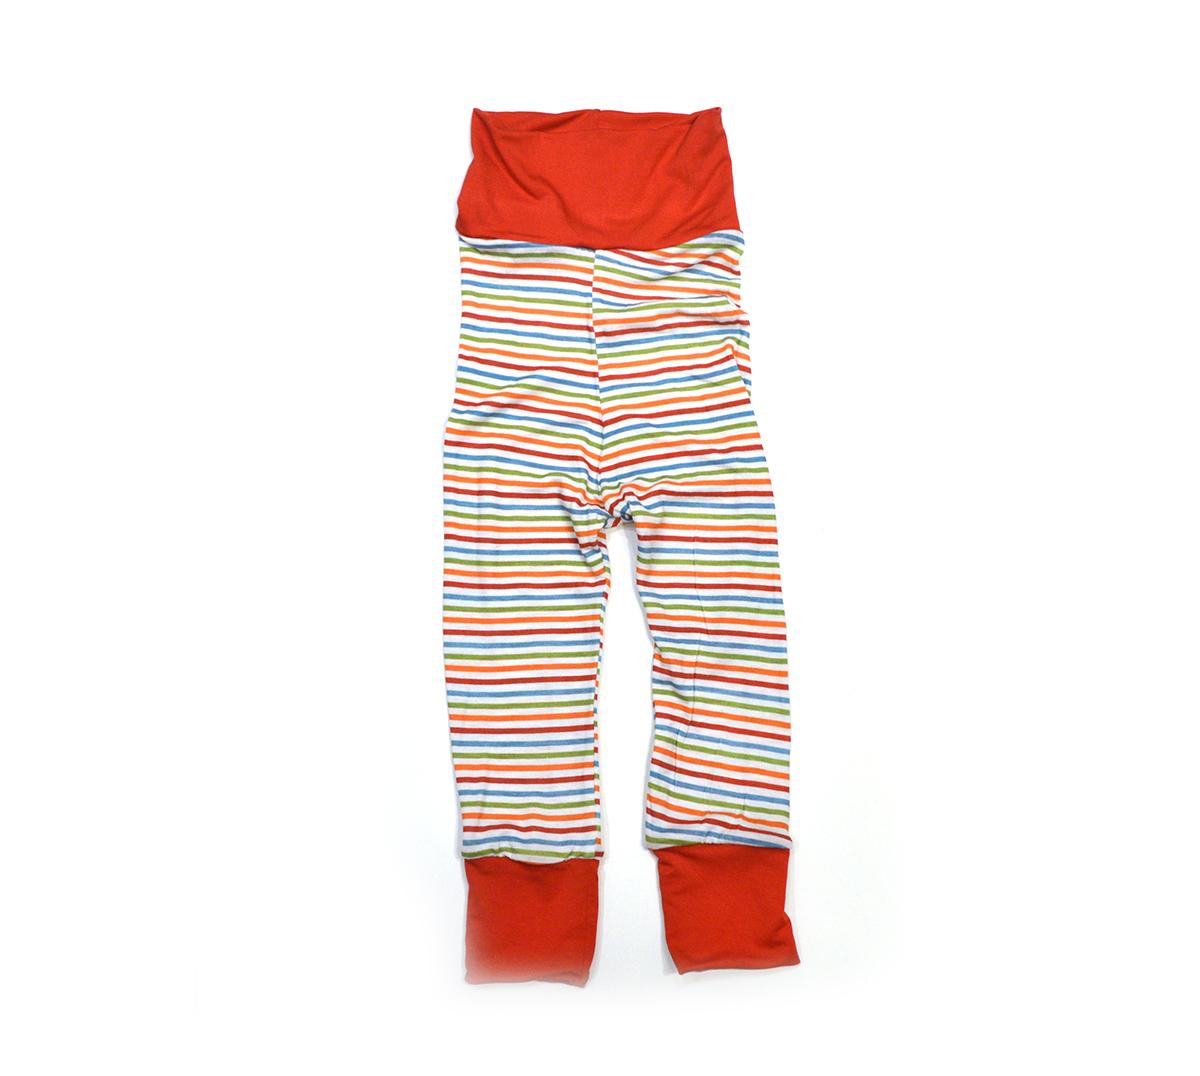 Little Sprout Pants™ Stripes SECONDS 00695